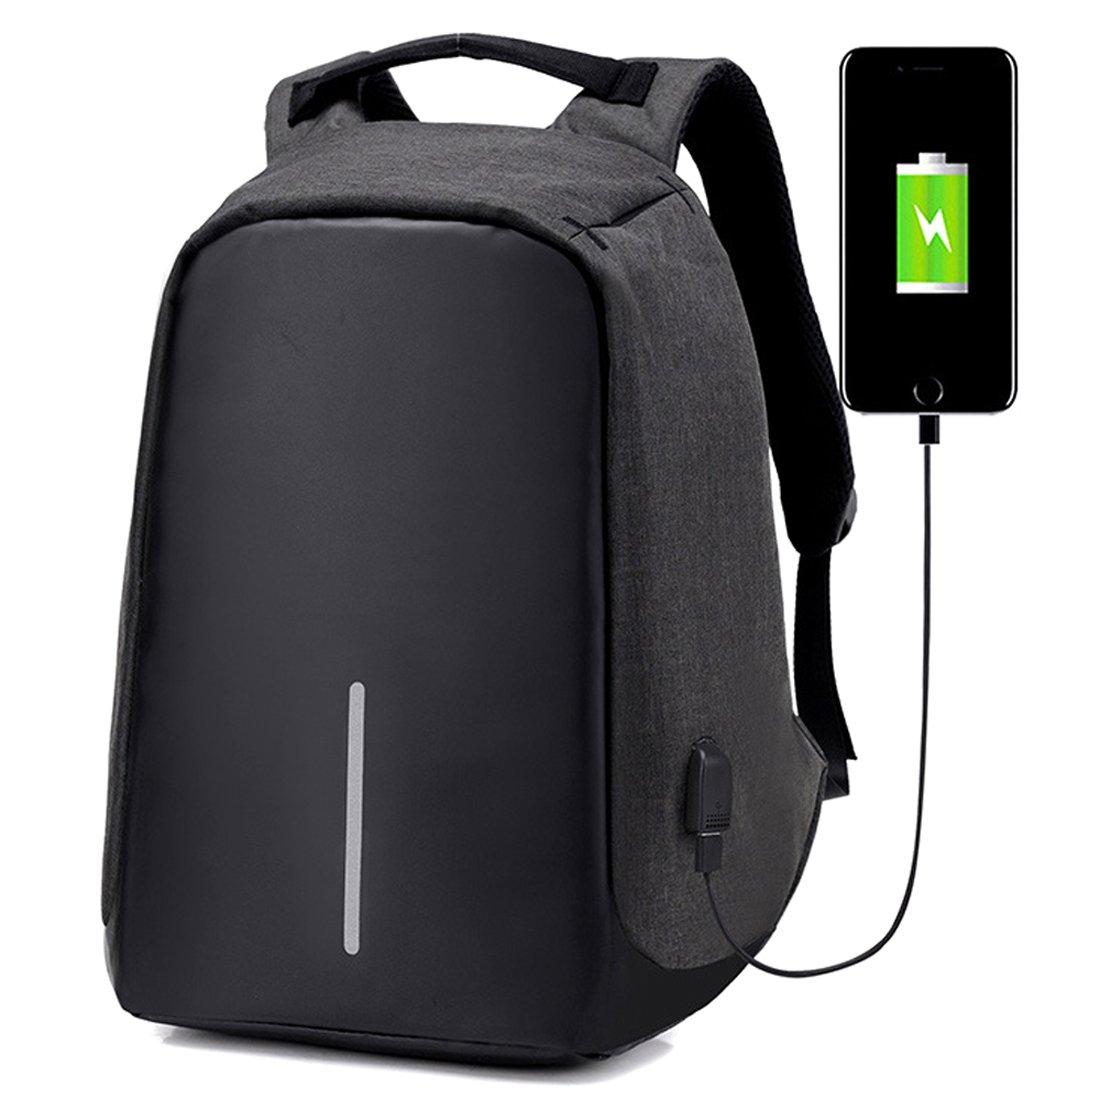 College Backpack, Business Laptop Backpack, Anti-theft Water Resistant Computer USB Charging Port, Lightweight Travel Bag Fit 15.6 Inch Laptops Tablets in Dark Indigo (Black)